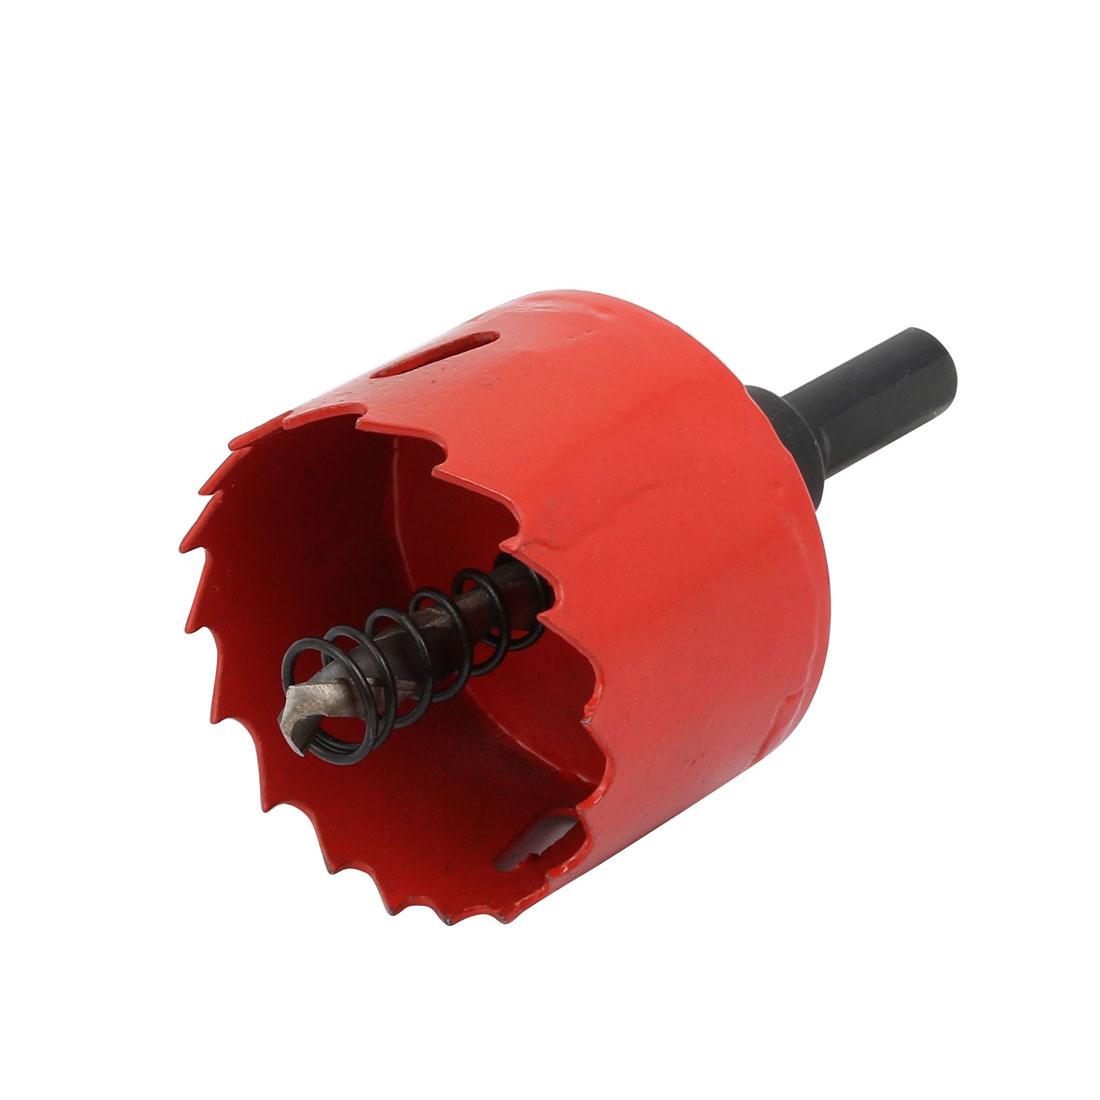 Twist Bit Triangle Shank 45mm Wood Plastic Drilling Red Hole Saw